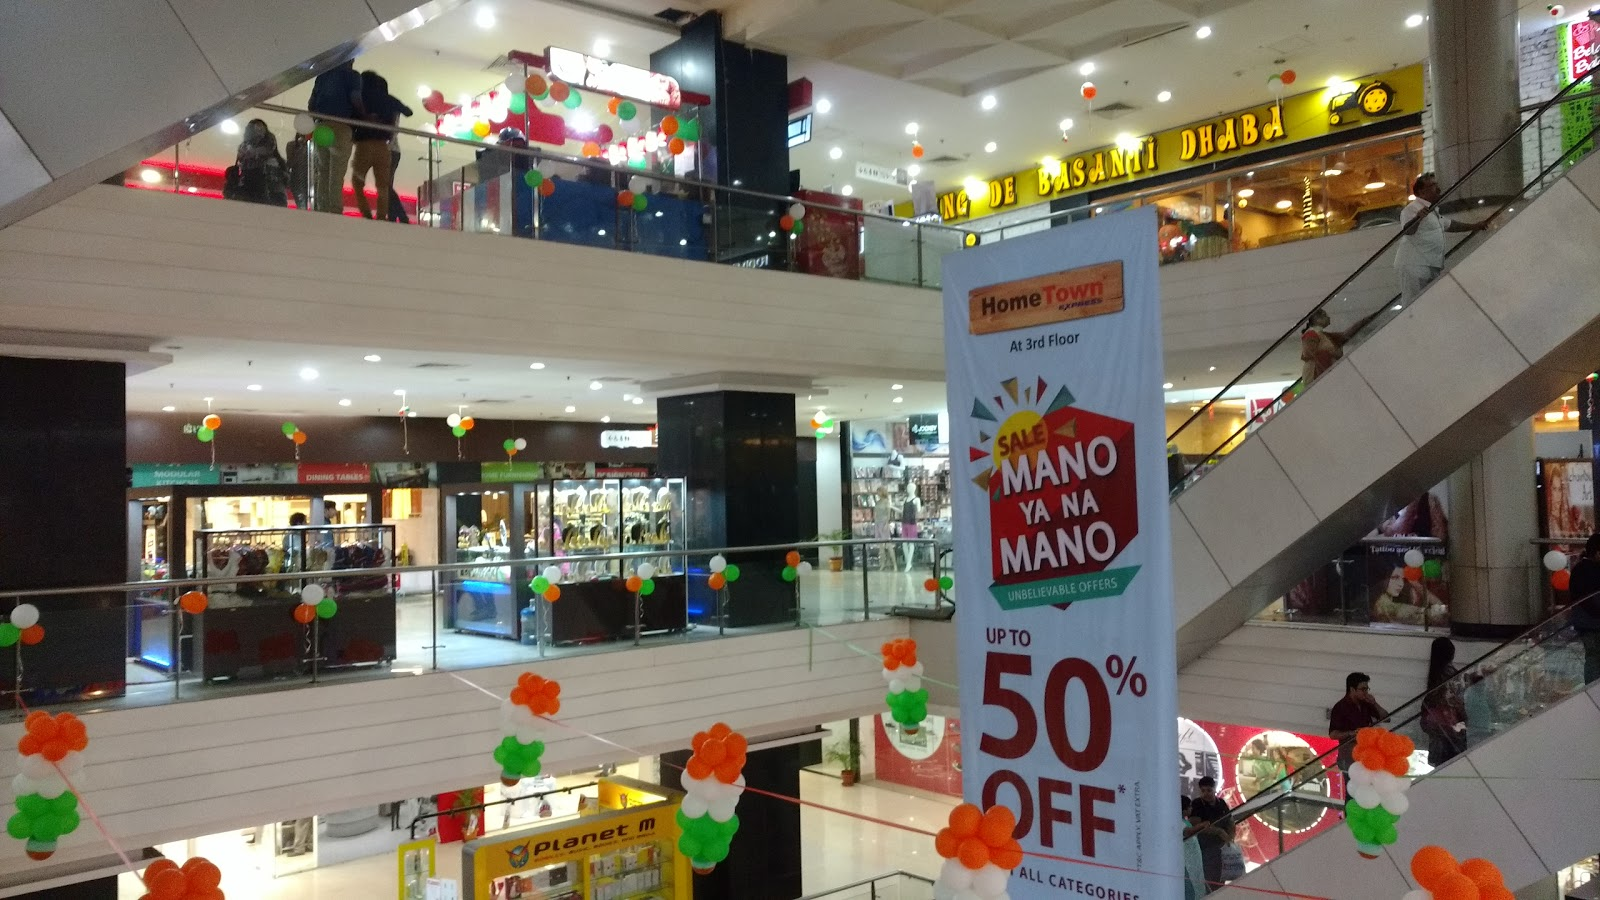 PVR (Diamond Plaza Mall)